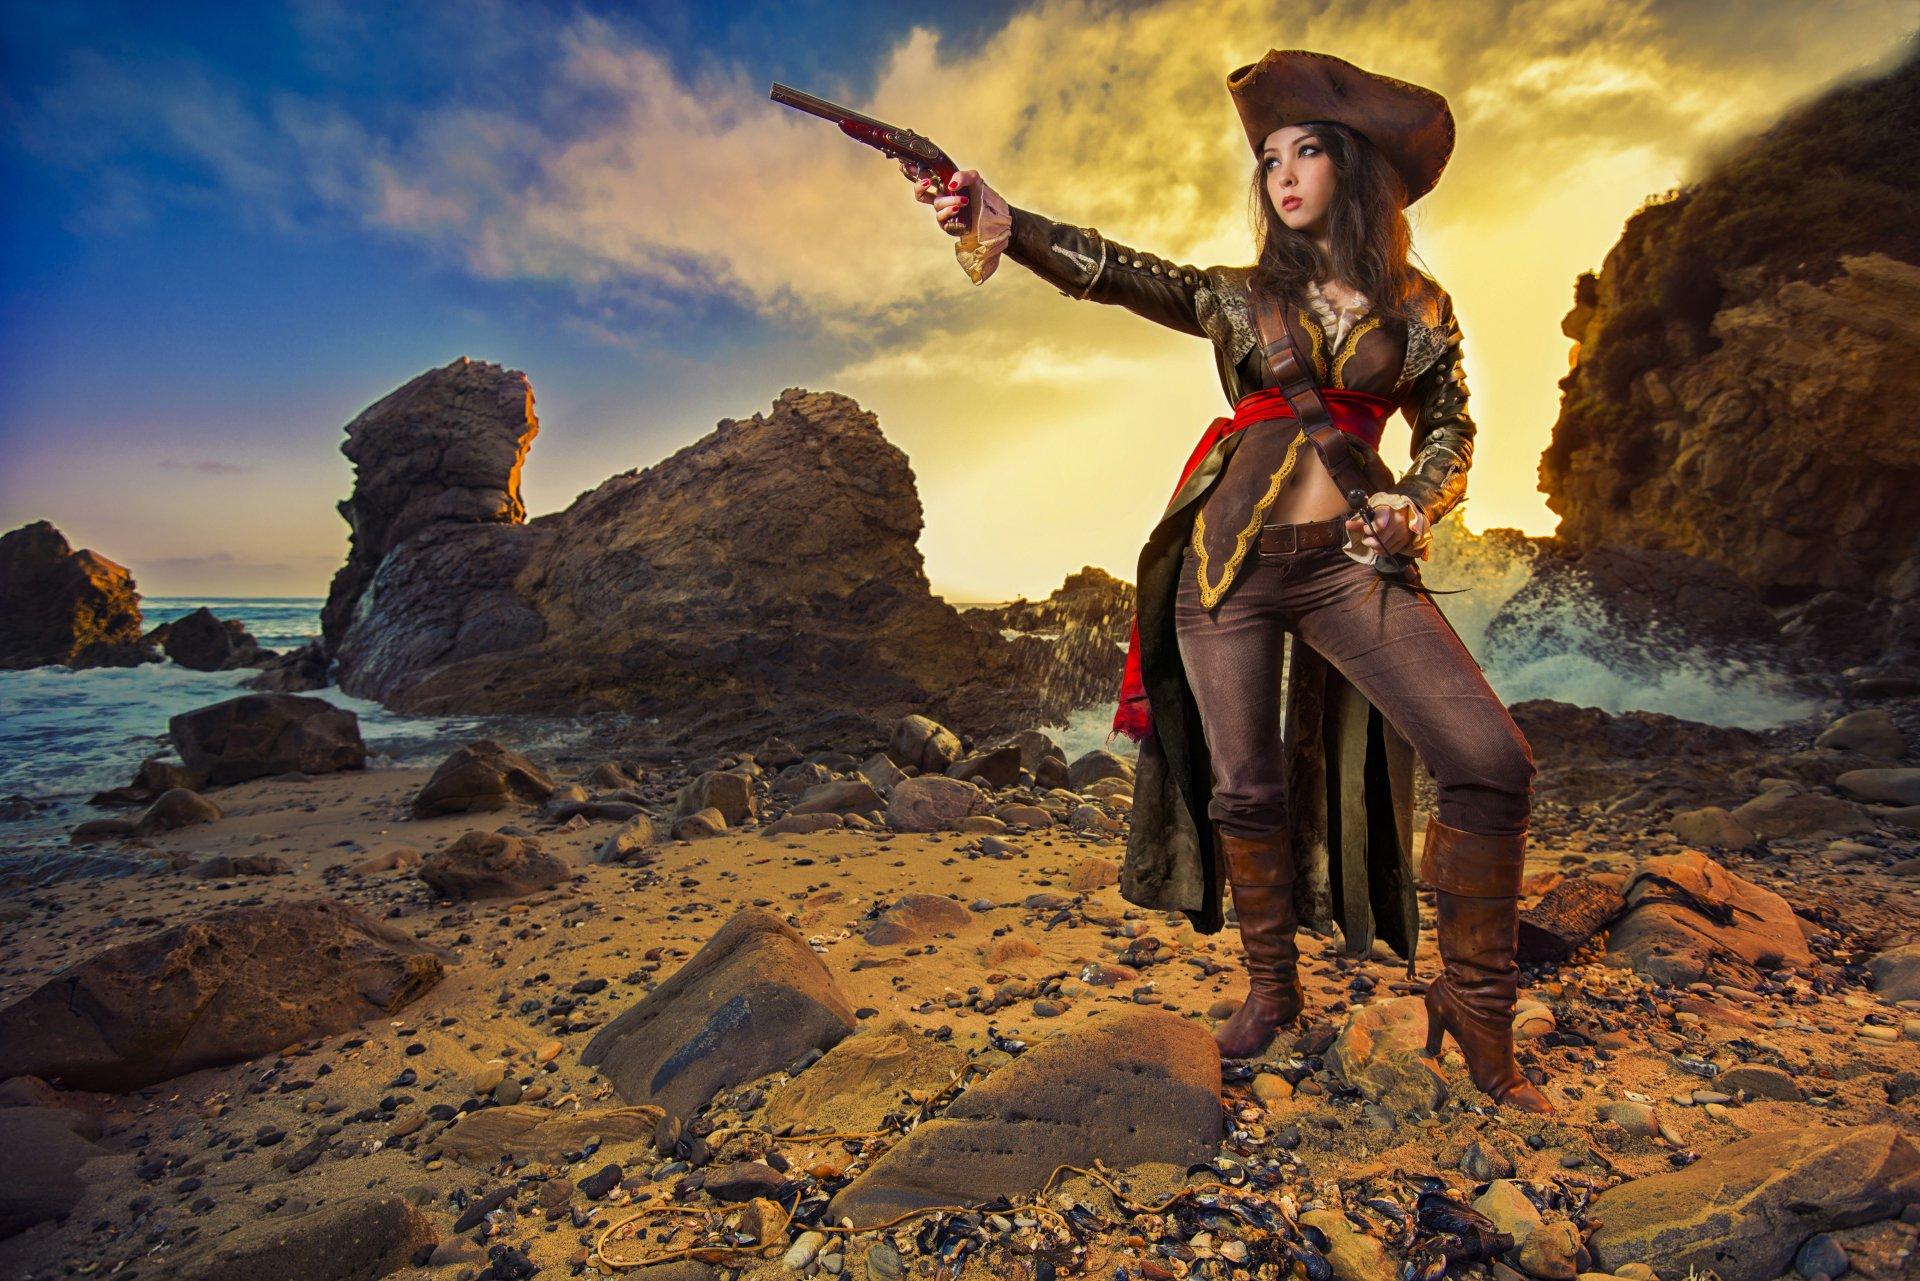 Mulheres - Cosplay  Pirata Papel de Parede